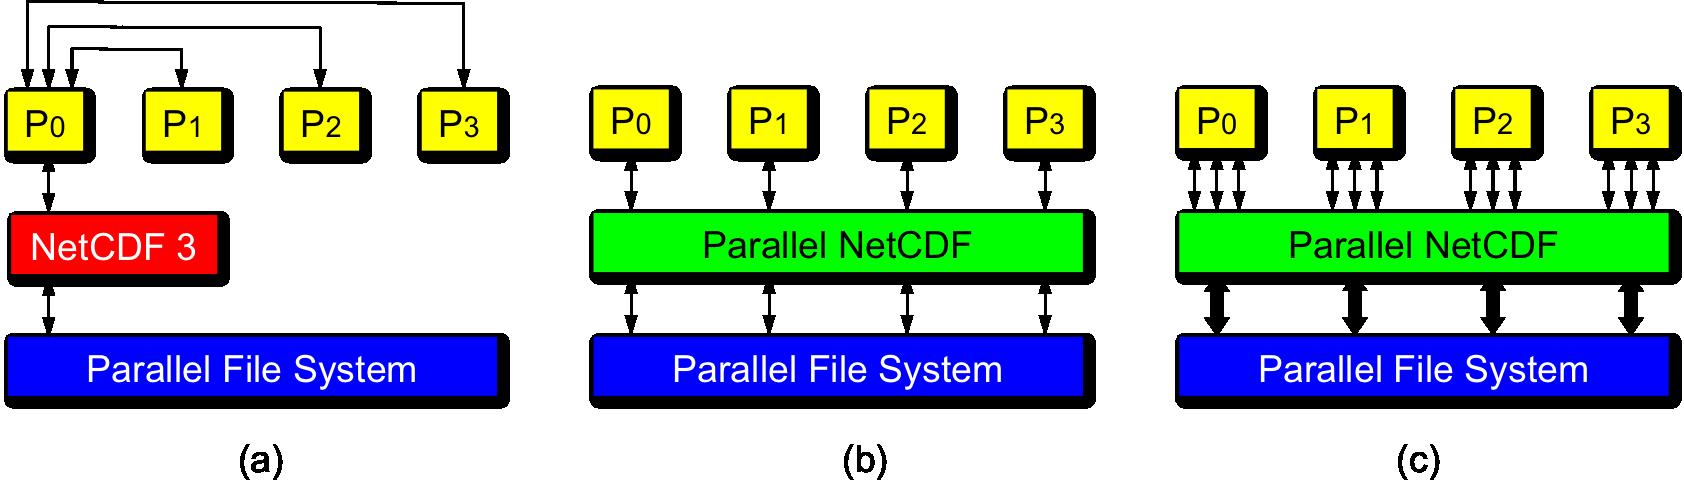 PnetCDF (Parallel netCDF)